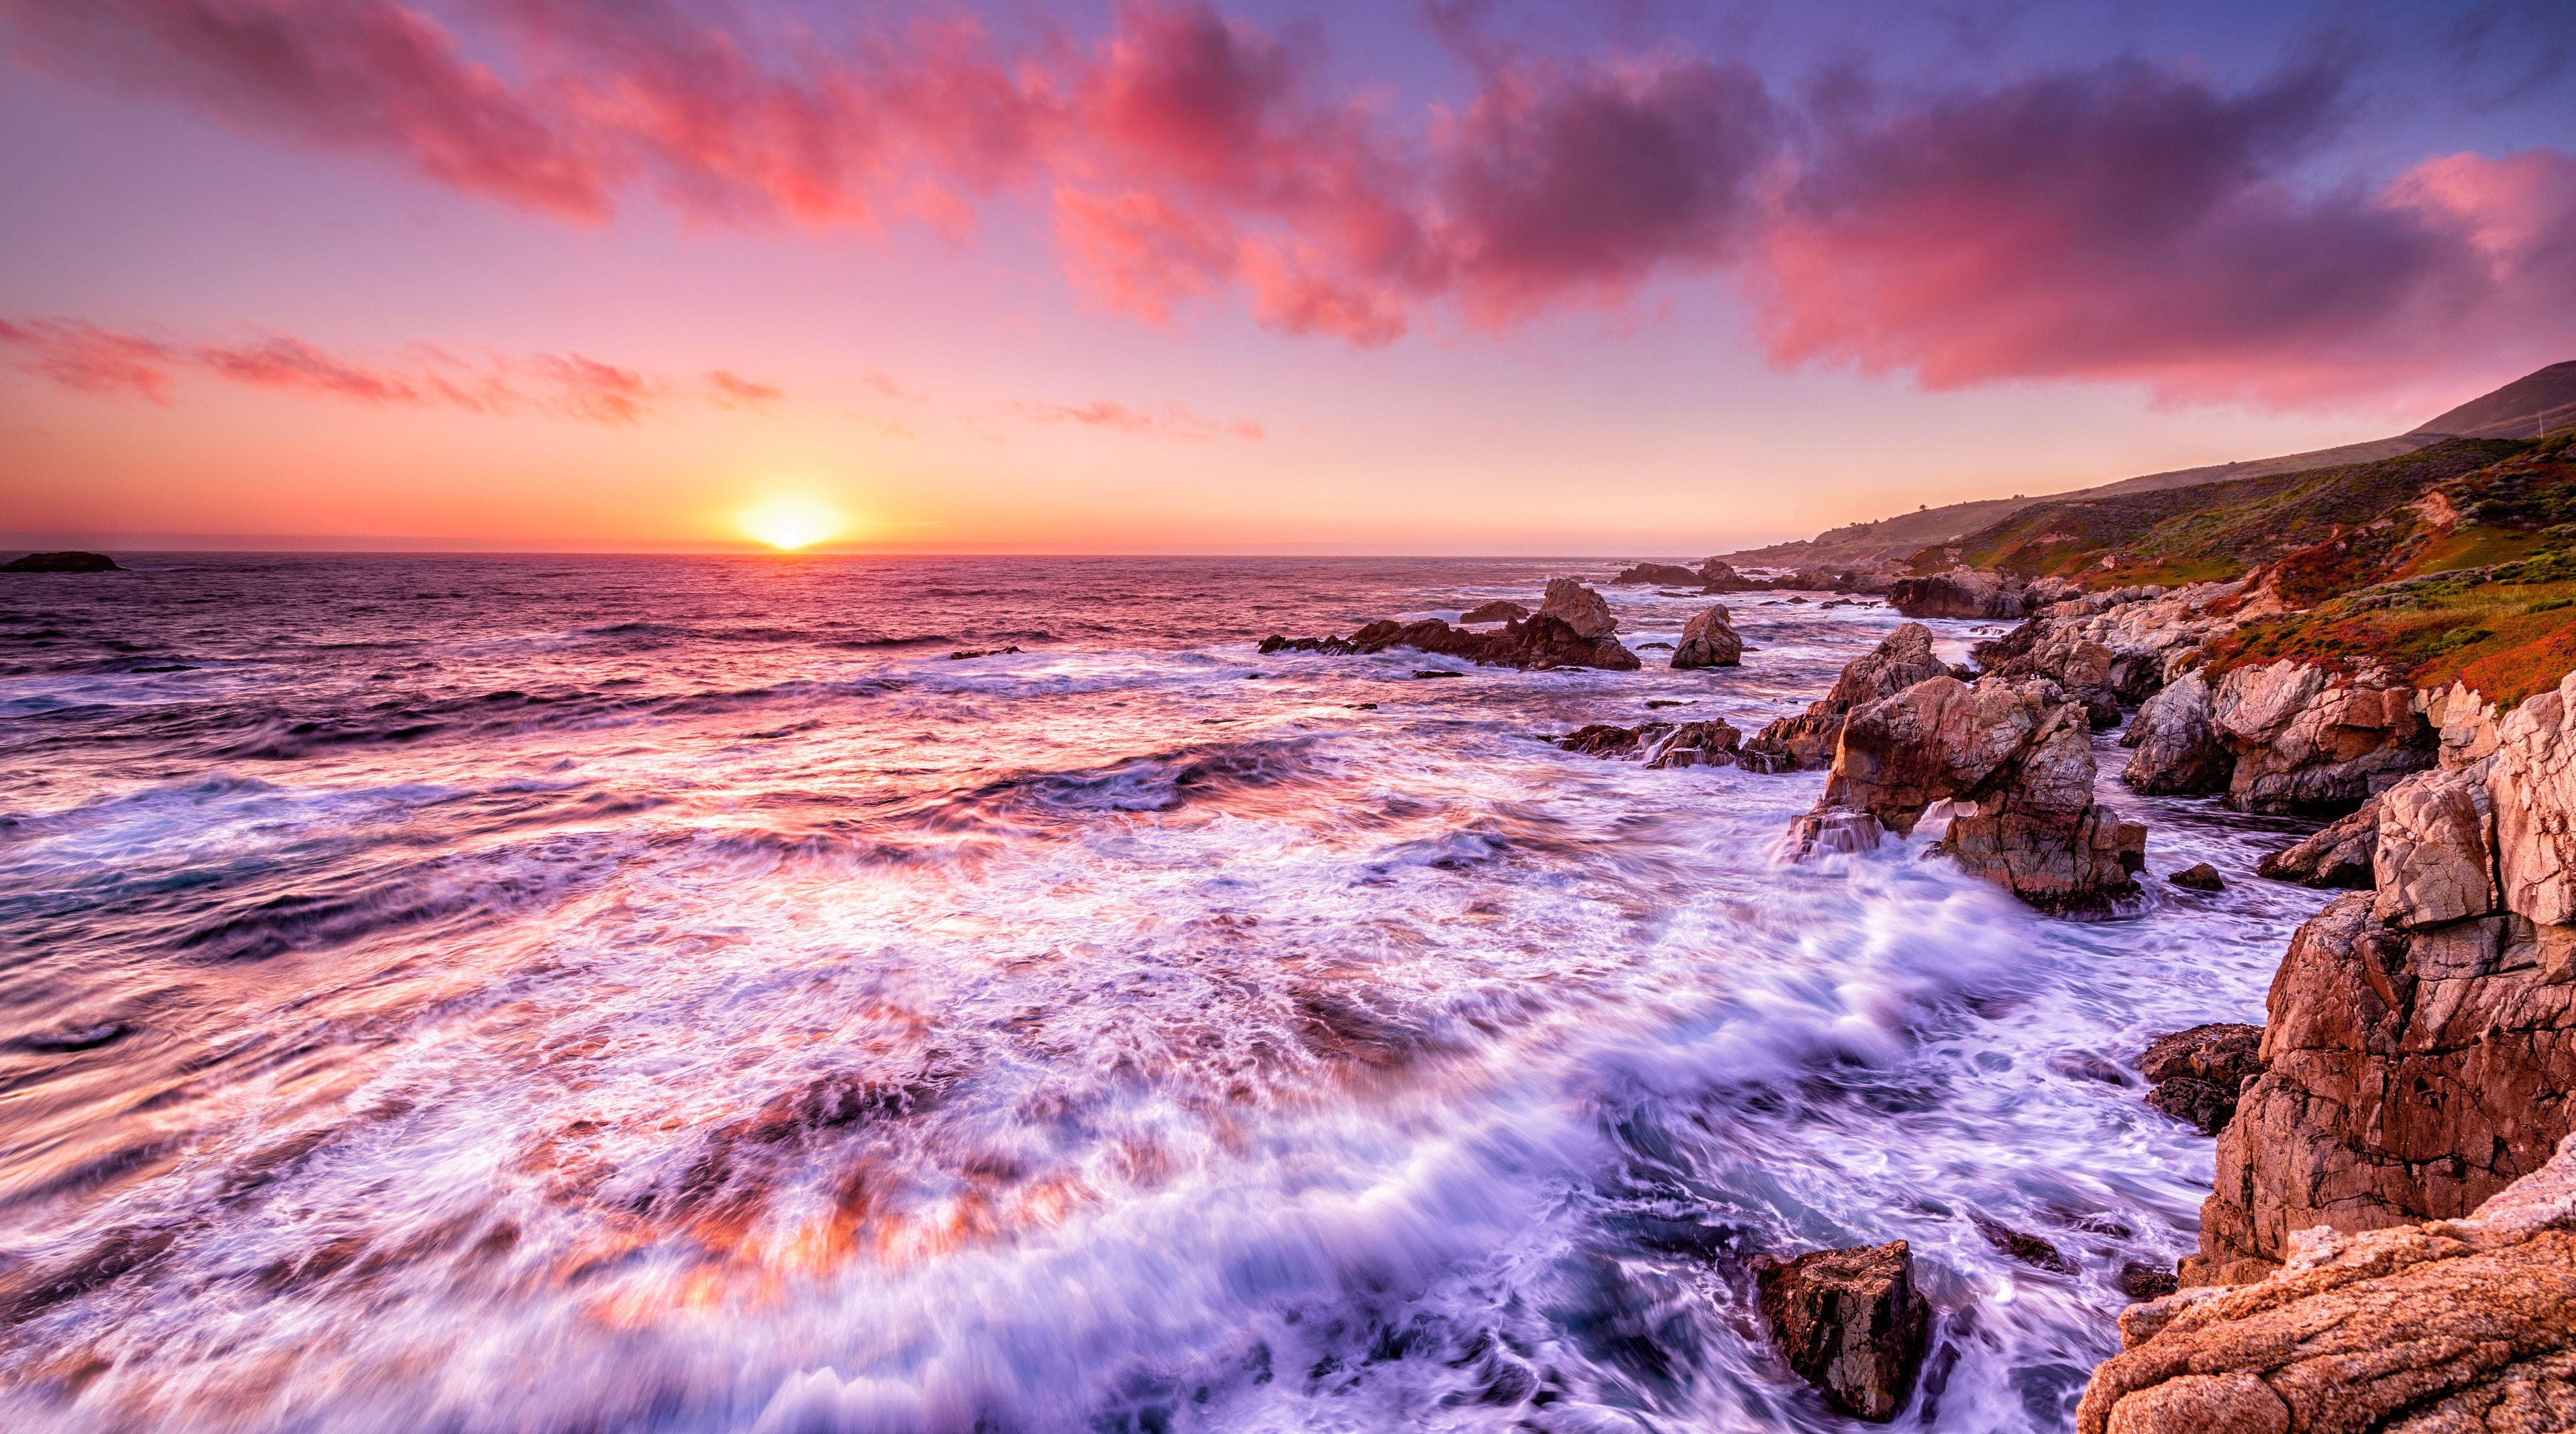 California Dreaming – Diving Southern California